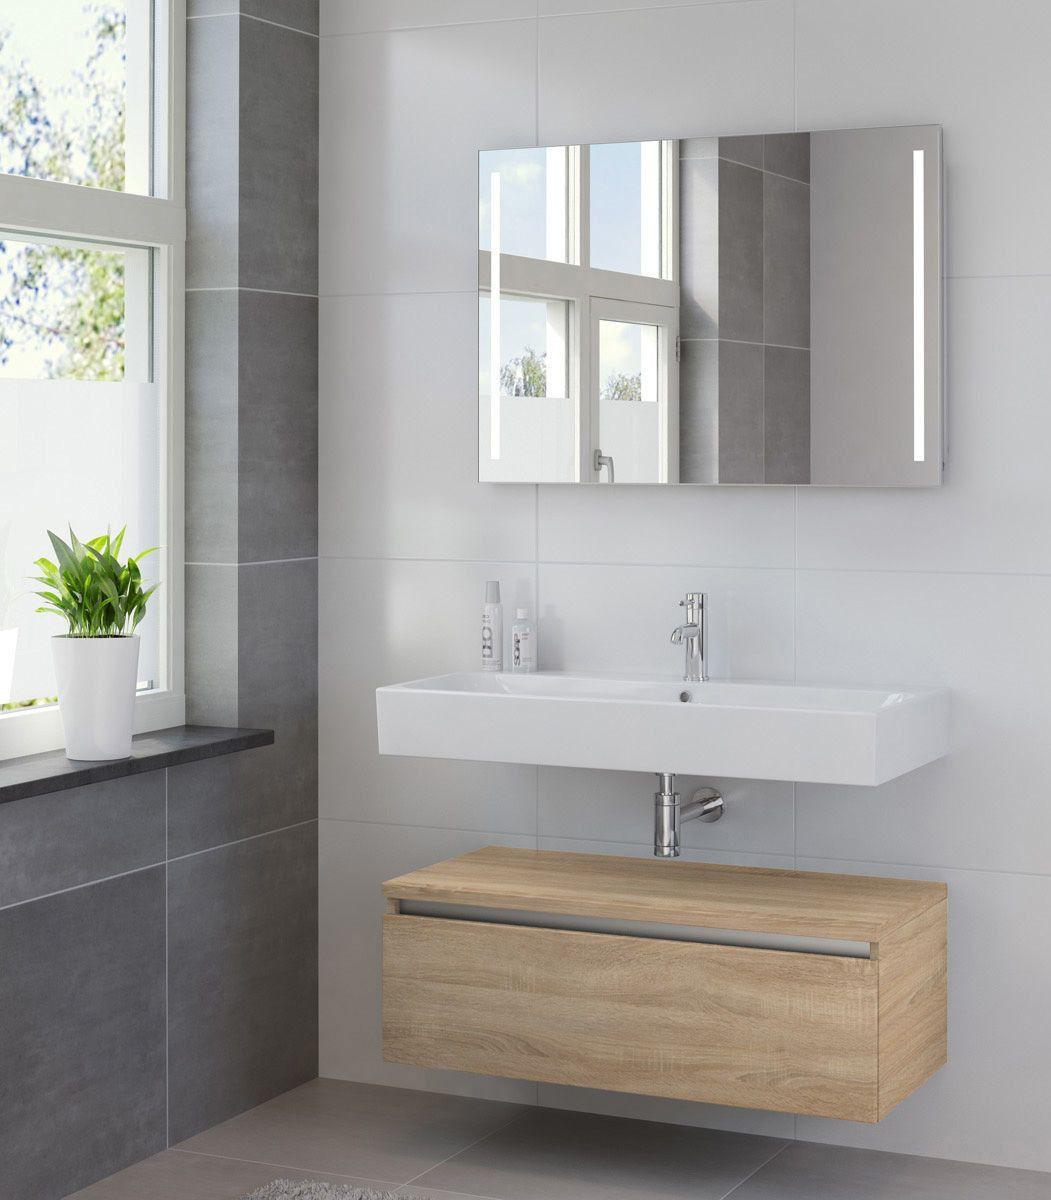 modern badkamer meubel: stoere grote wastafel en losse wastafel, Badkamer